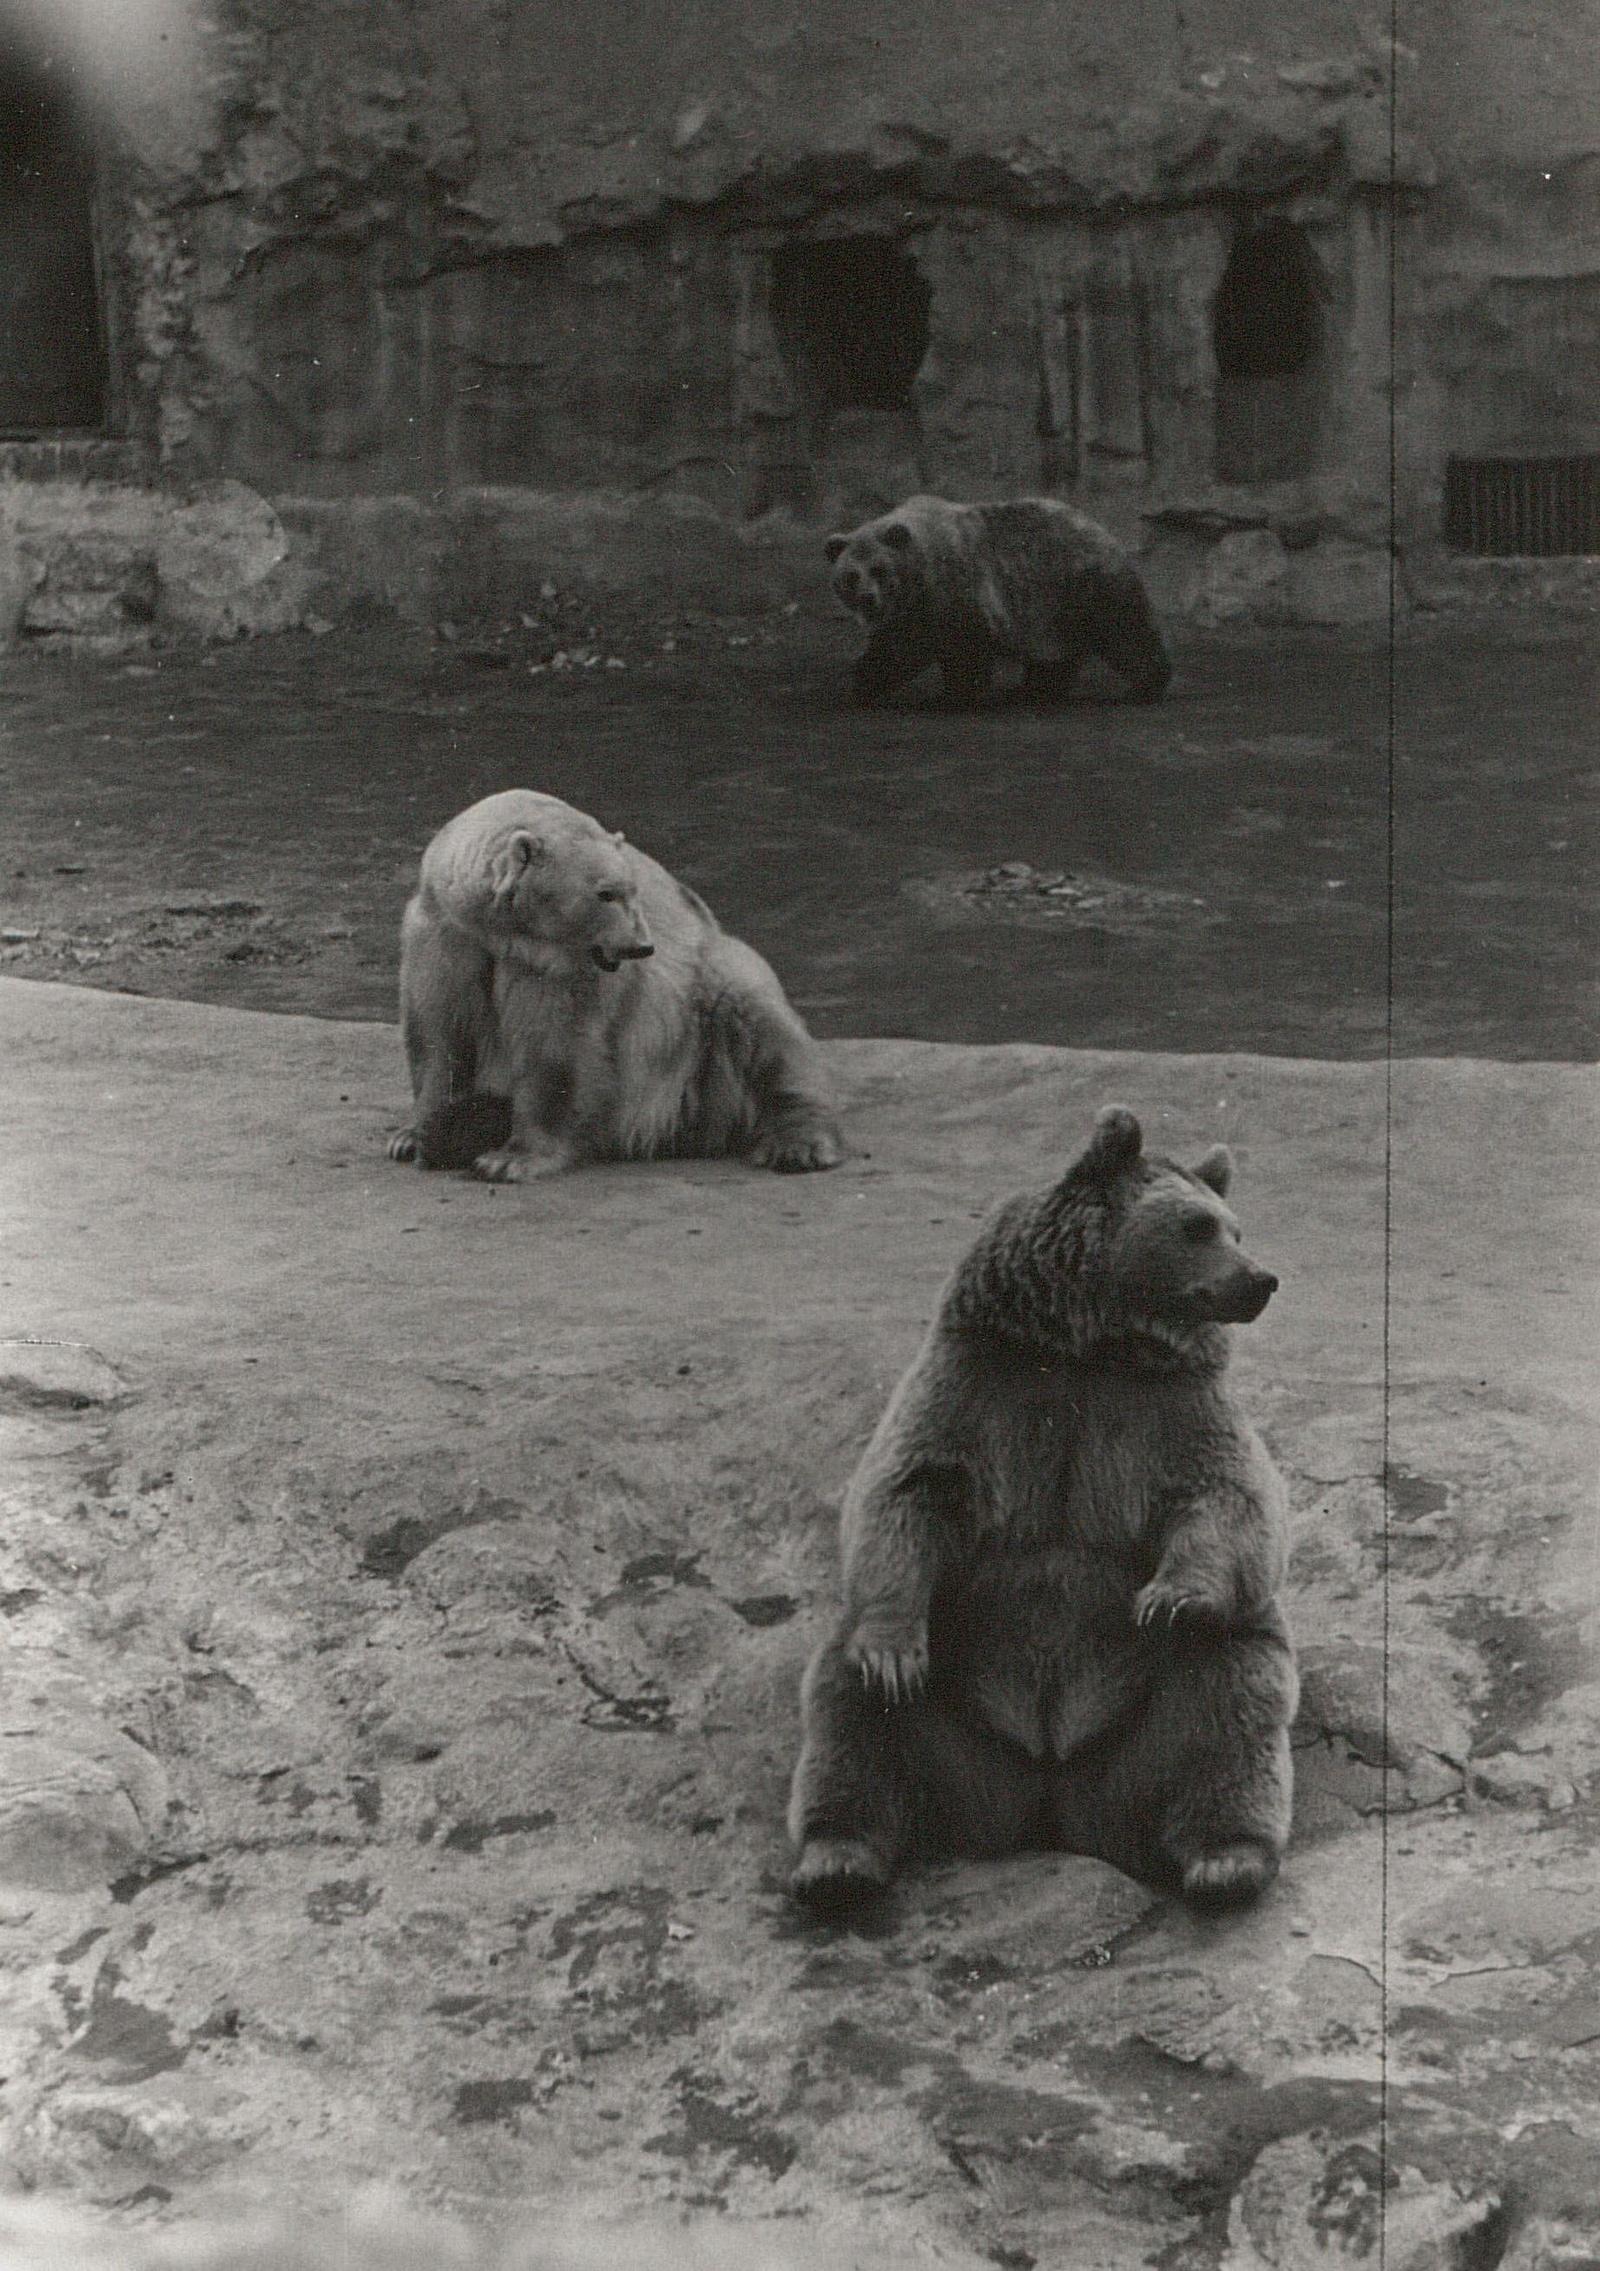 Московский зоопарк. Медведи